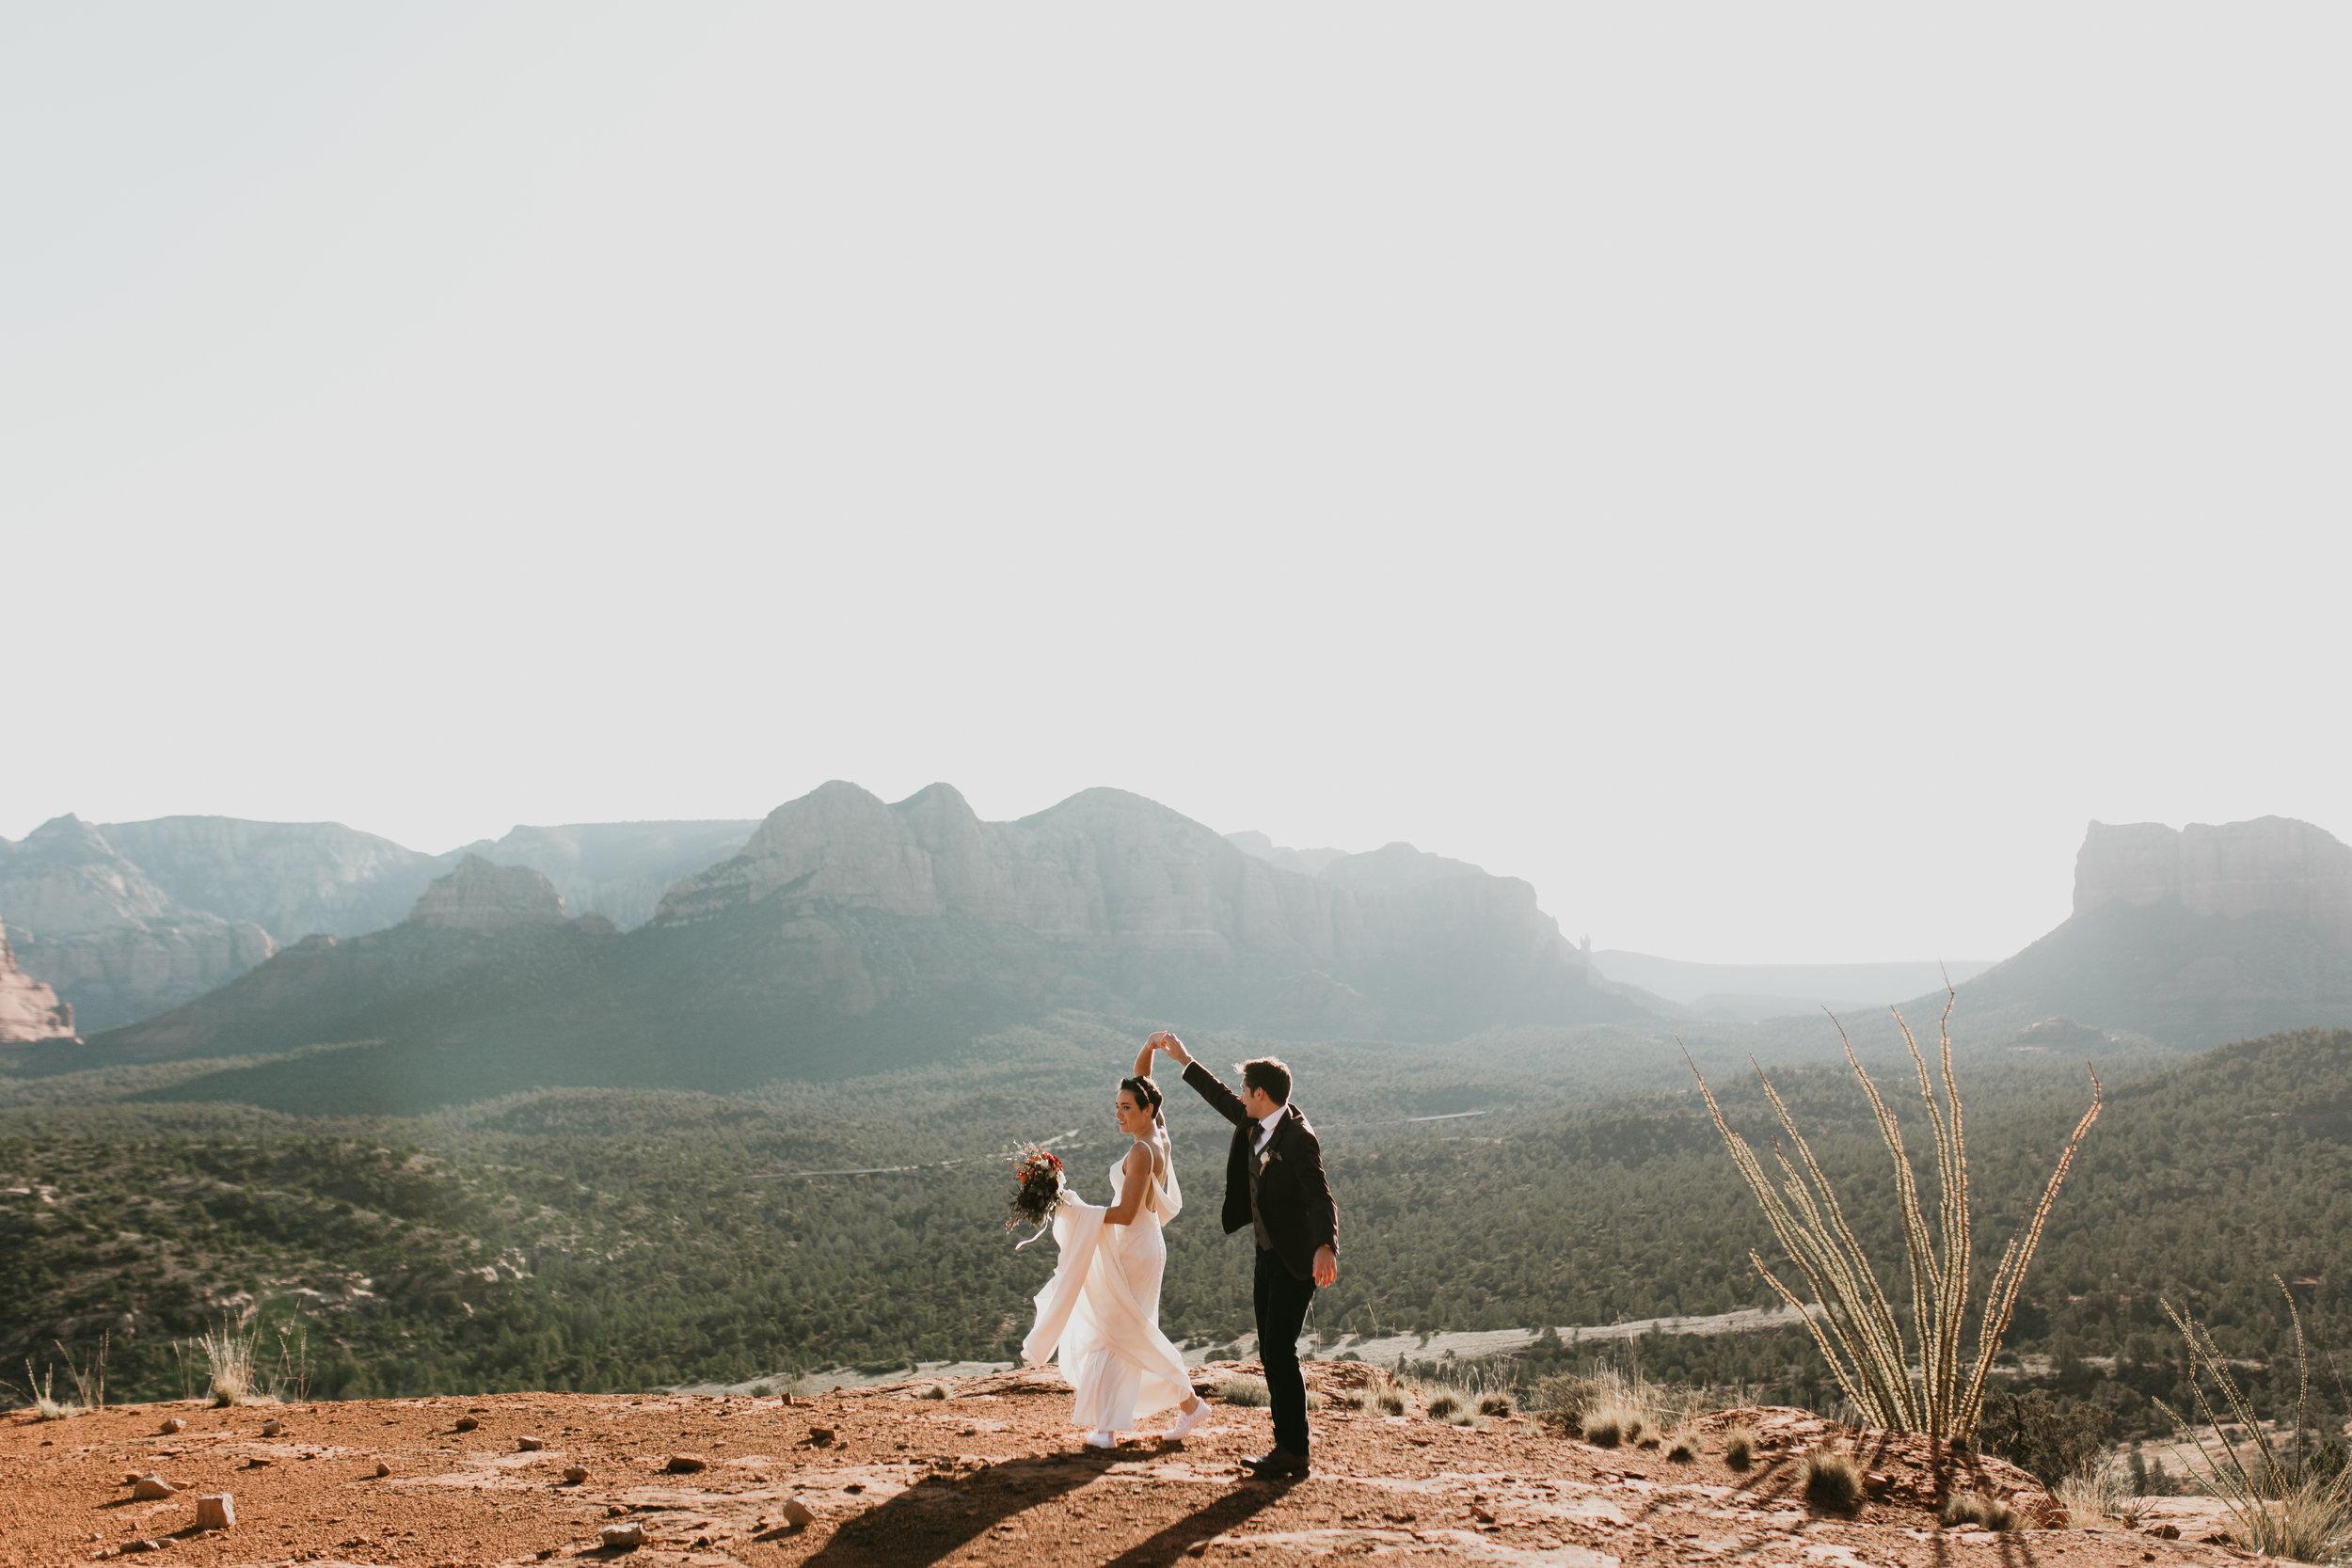 nicole-daacke-photography-sedona-arizona-destination-elopement-wedding-photographer-catherdral-rock-hiking-elopement-sedona-river-elopement-photos-desert-rock-wedding-photographer-laid-back-spontaneous-elopement-64.jpg